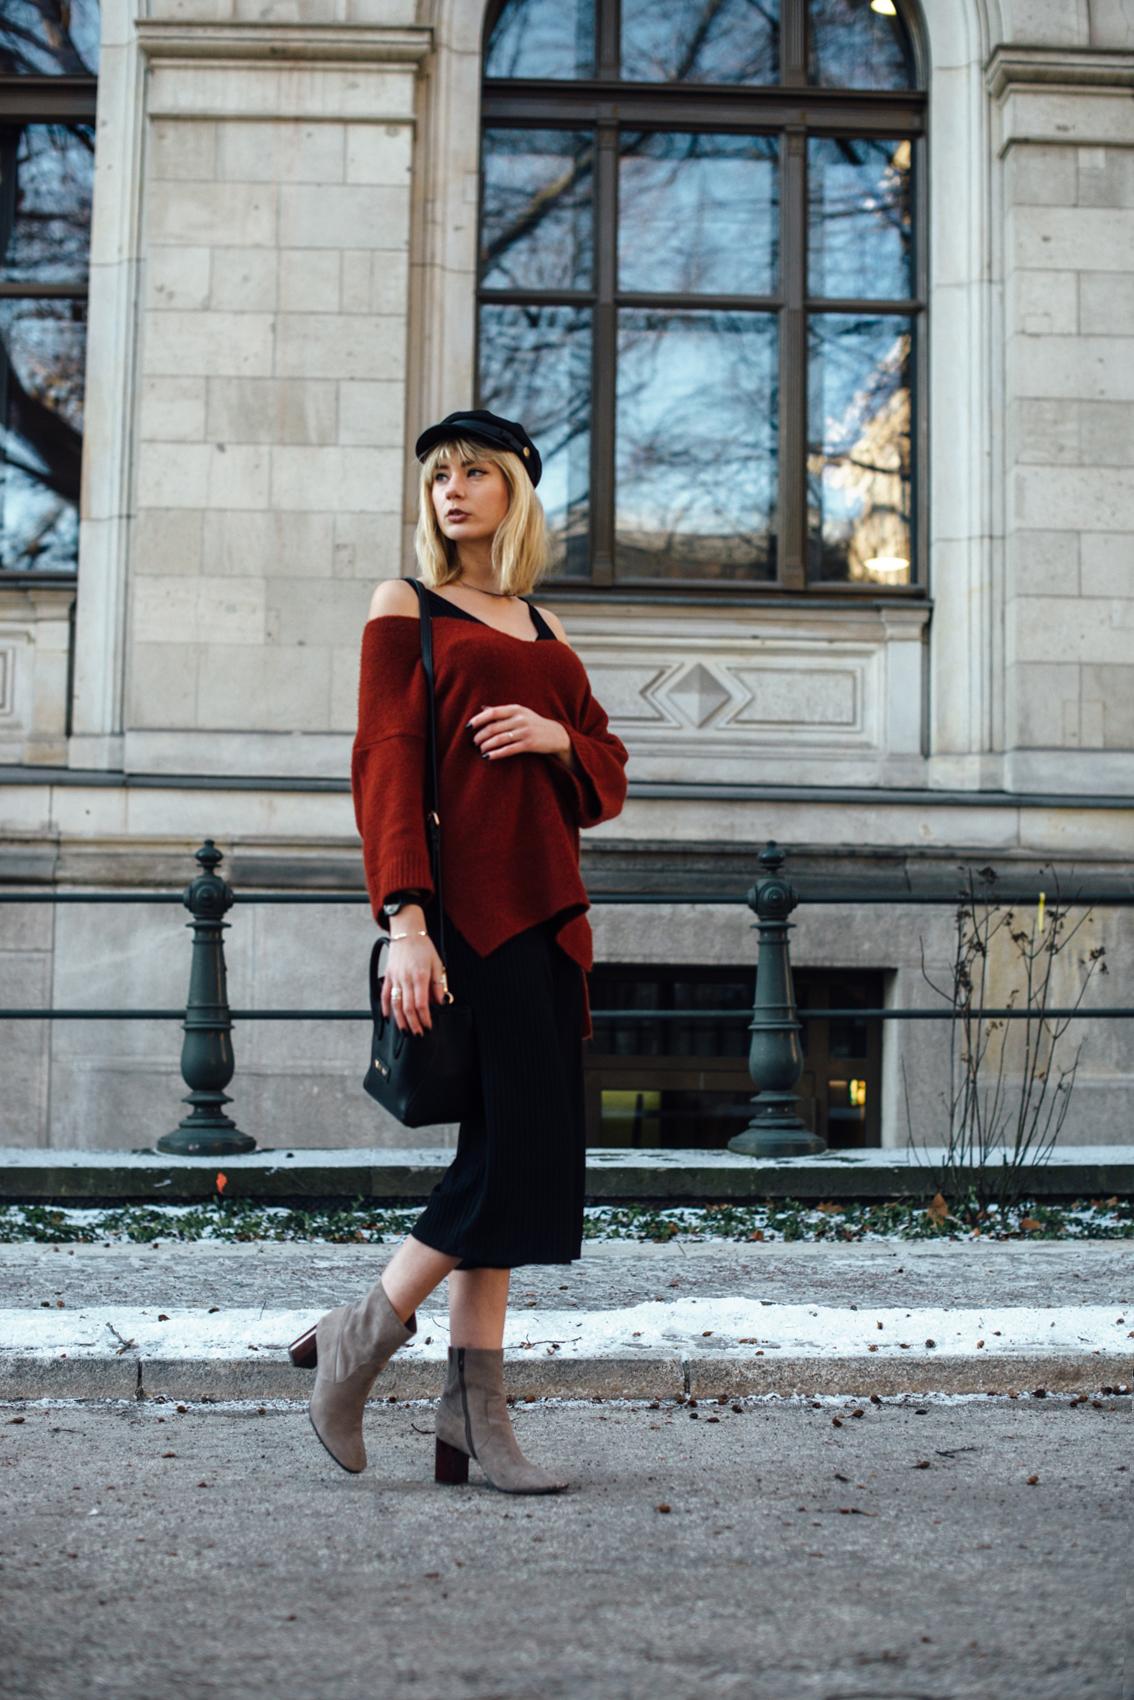 04-Kiamisu-Modeblog-Fashion Week Berlin_Shearling Jacke_Tamaris Stiefeletten_Schiebermütze-14